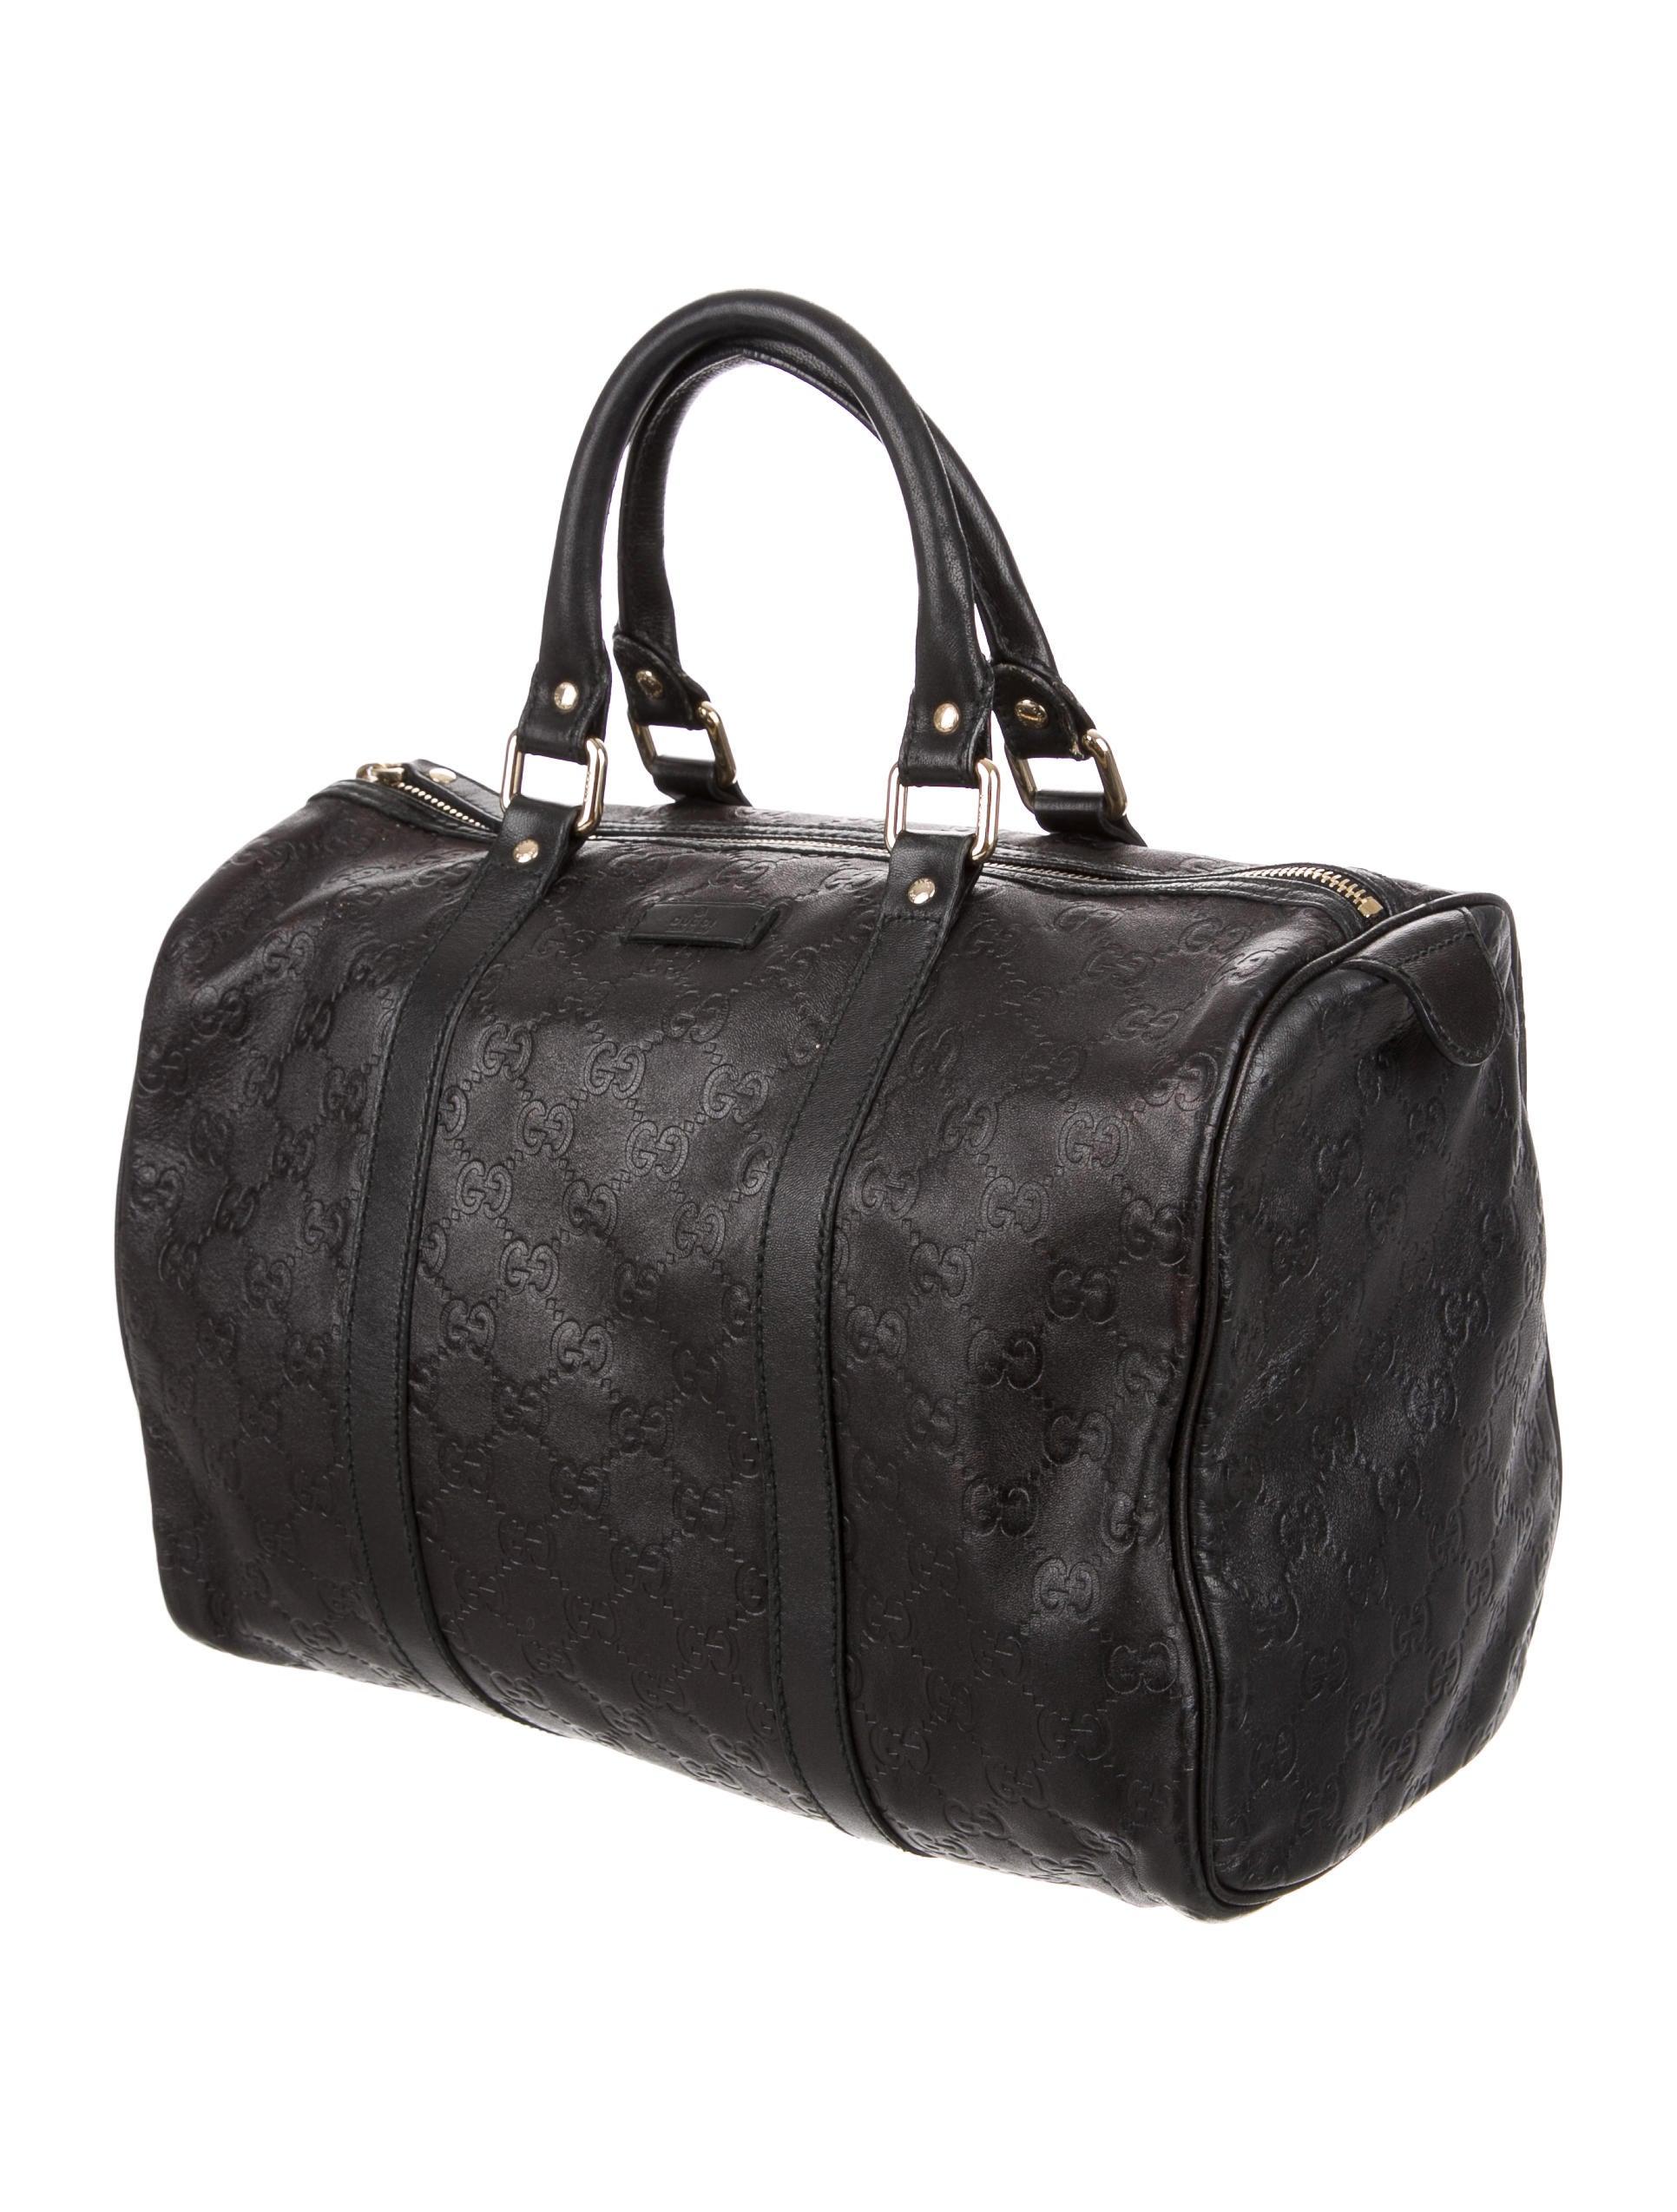 Boston Bag Patchwork Tutorial: Gucci Guccissima Boston Bag - Handbags - GUC140979